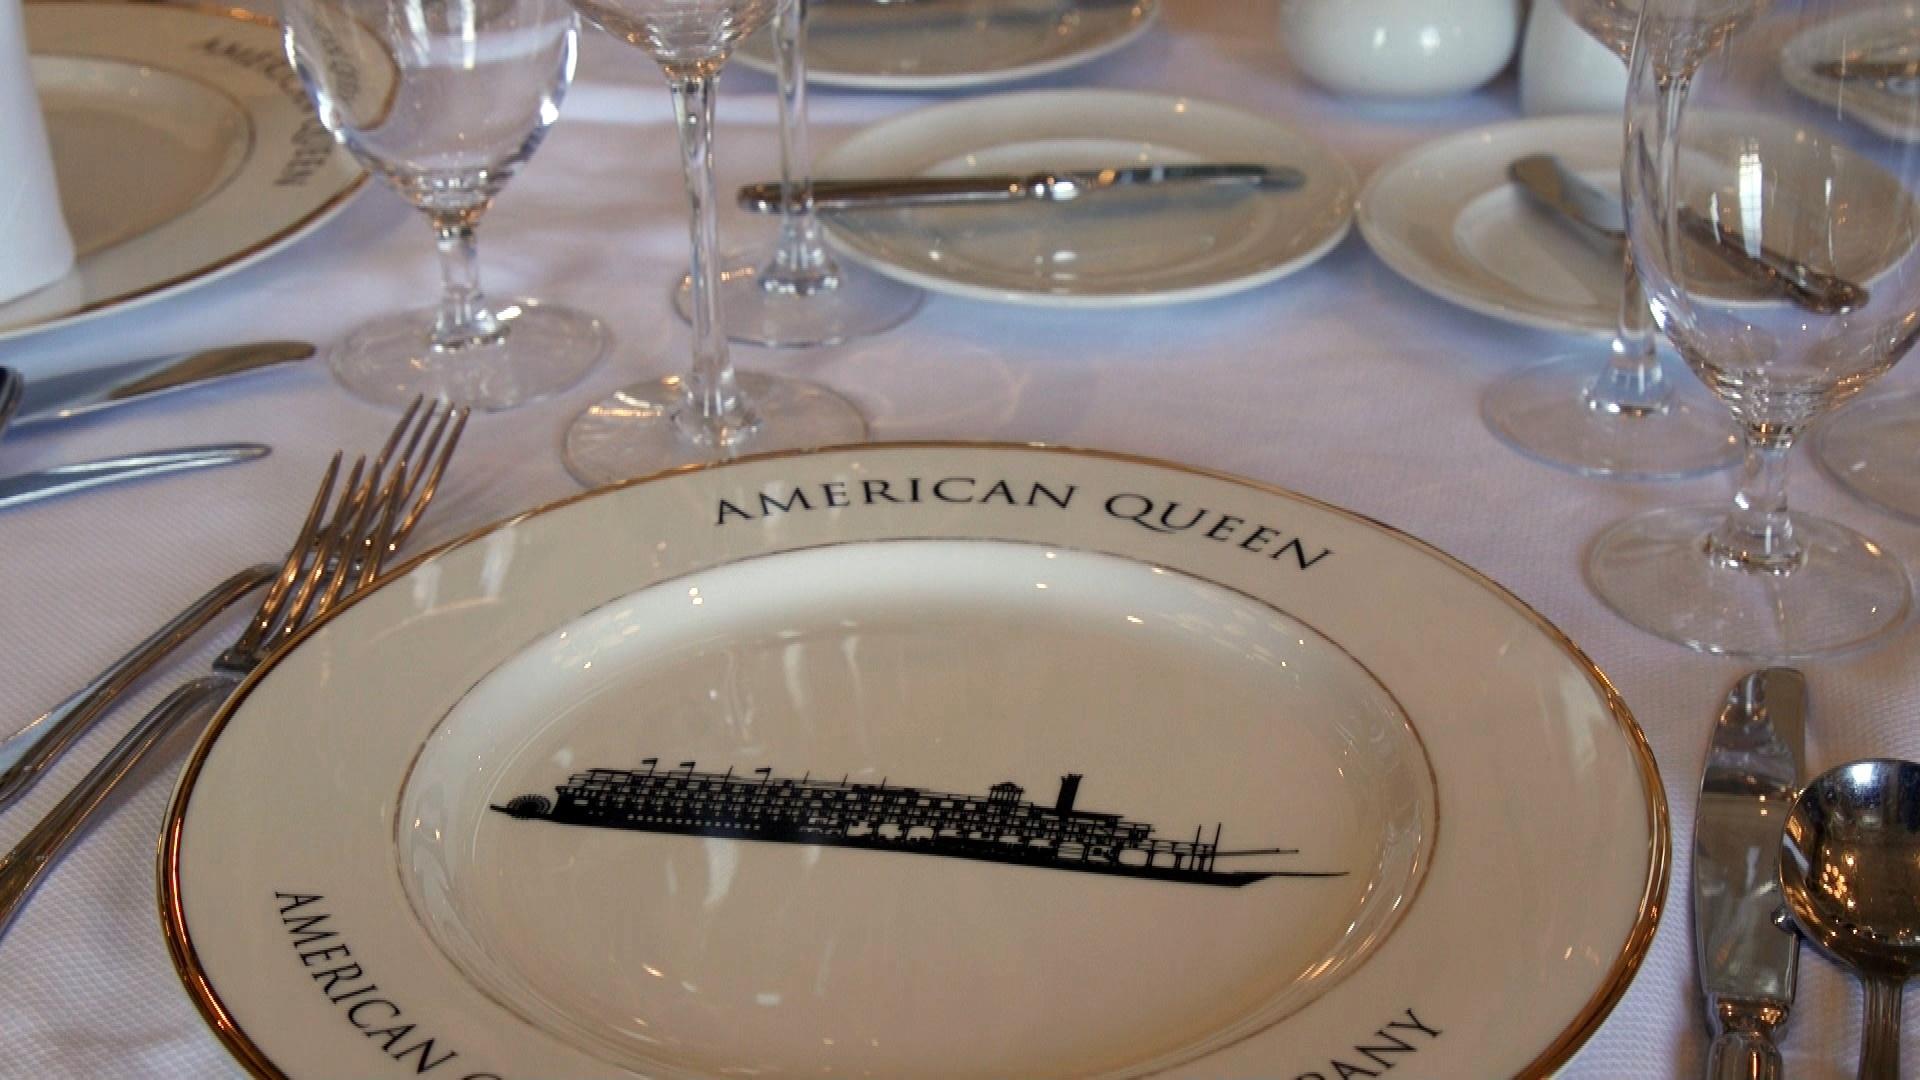 American Queen dinner setting